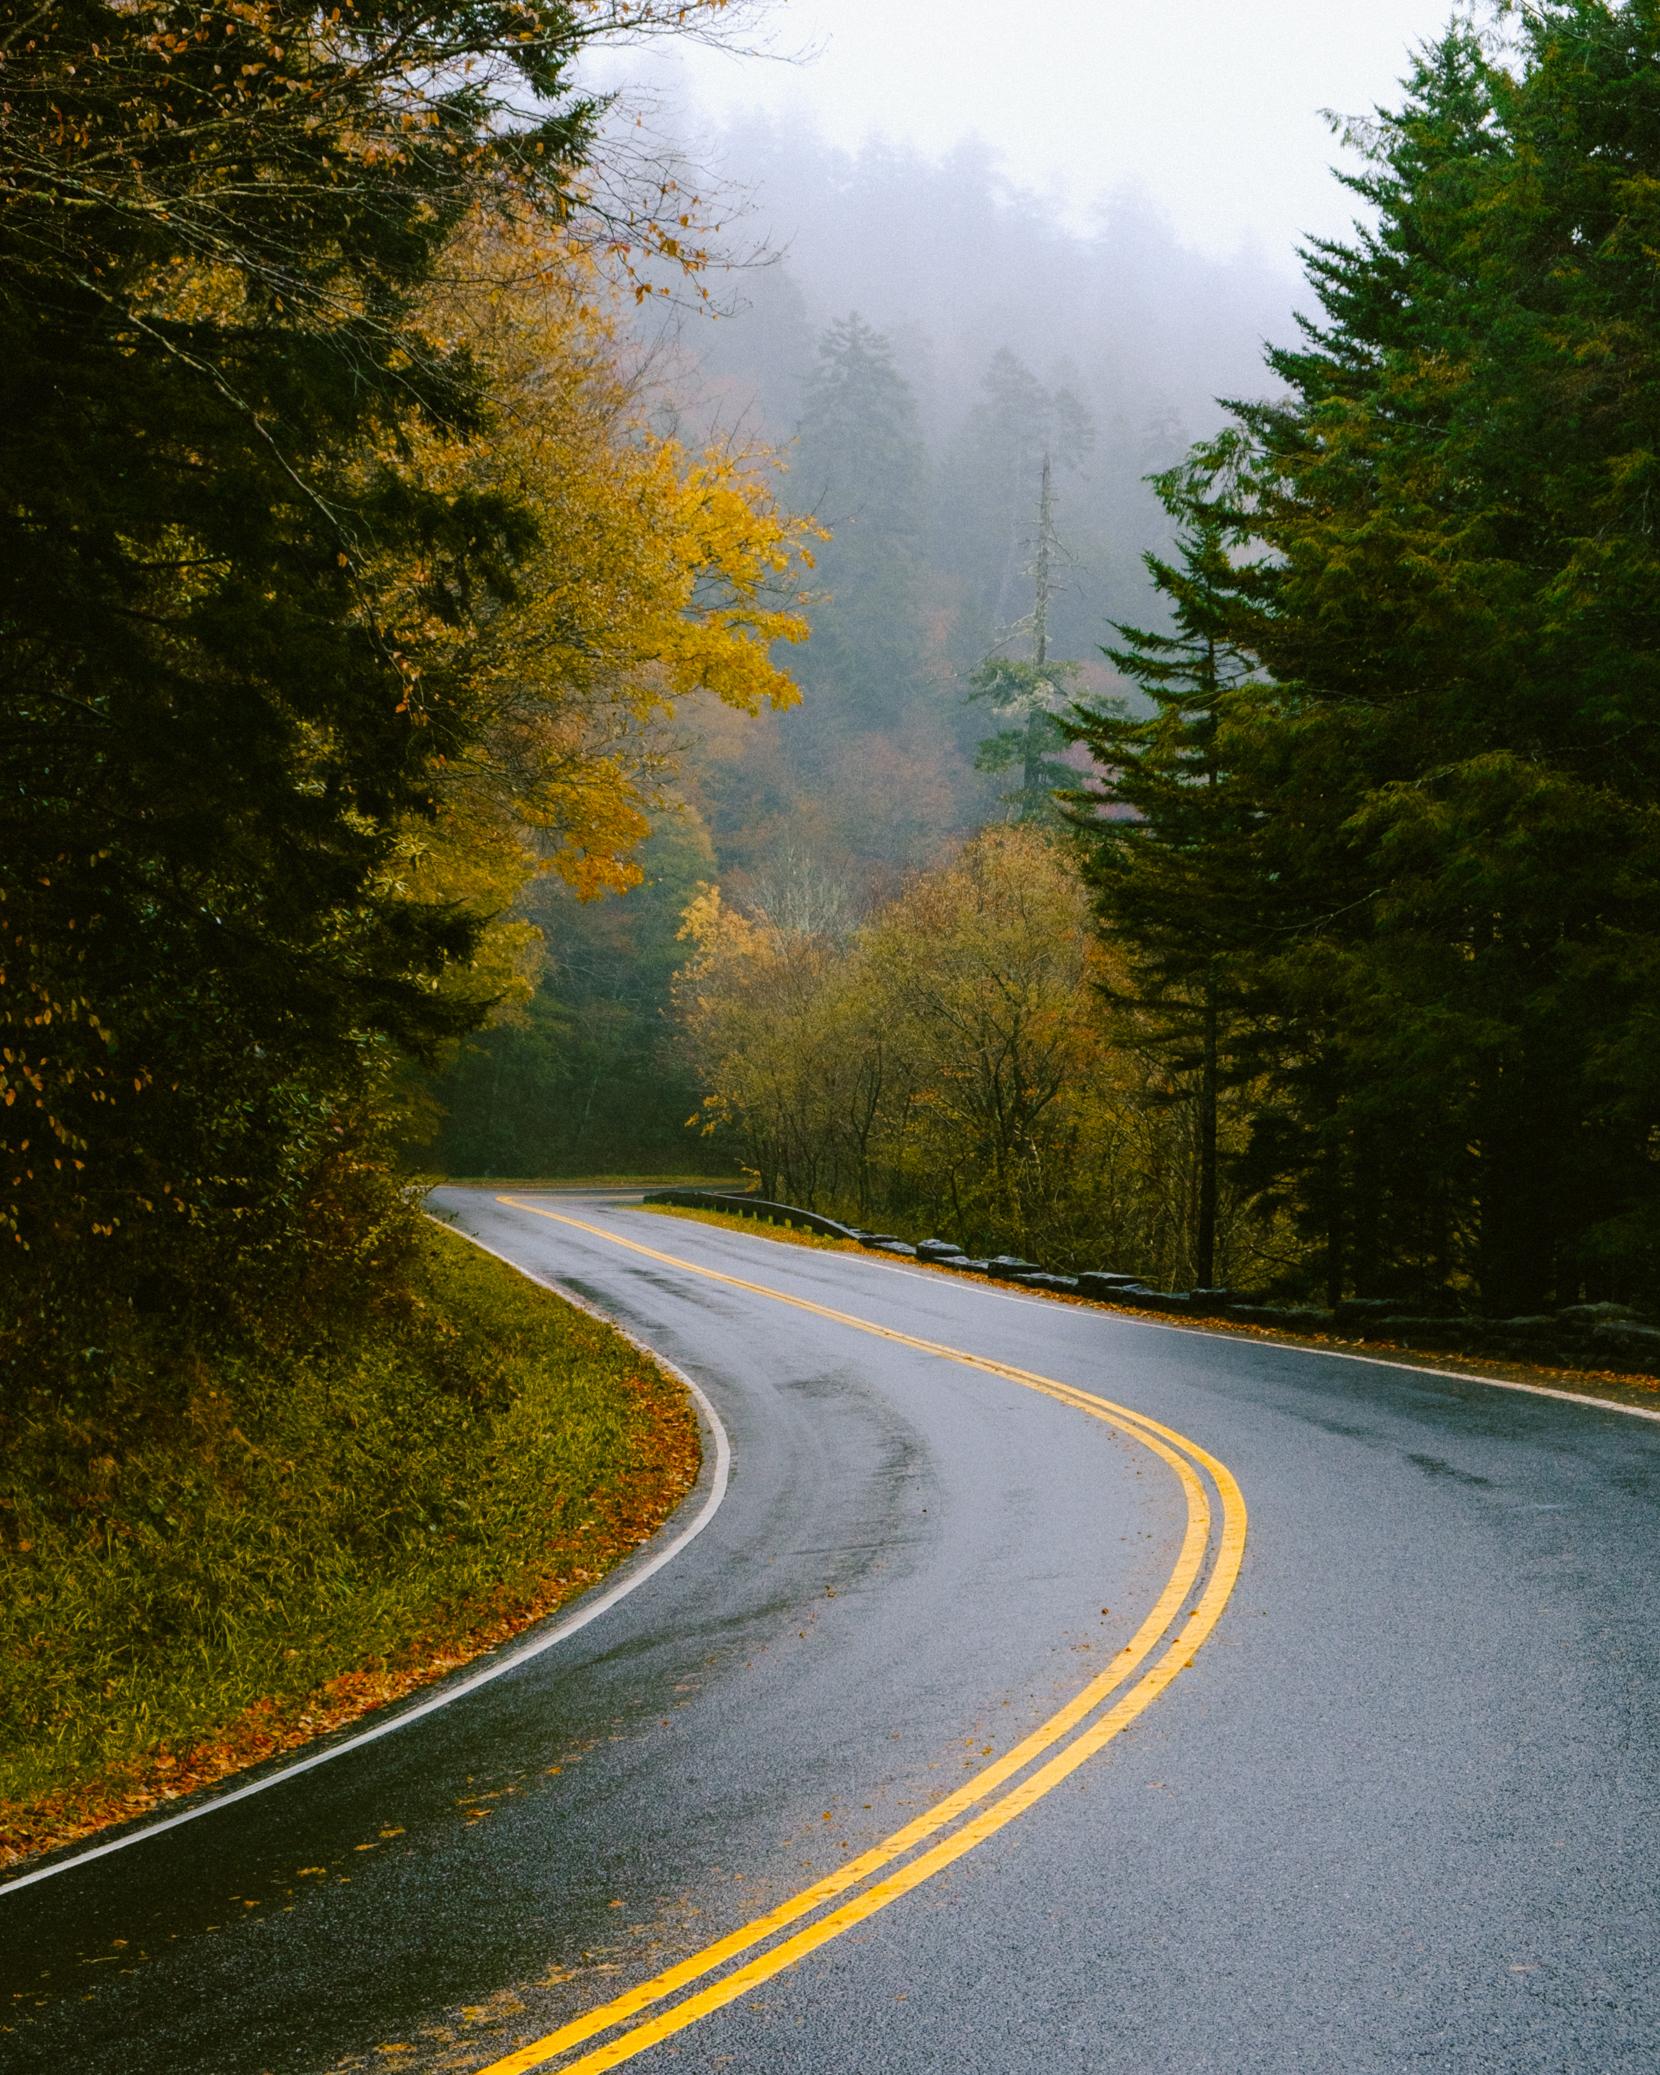 More perfect roads